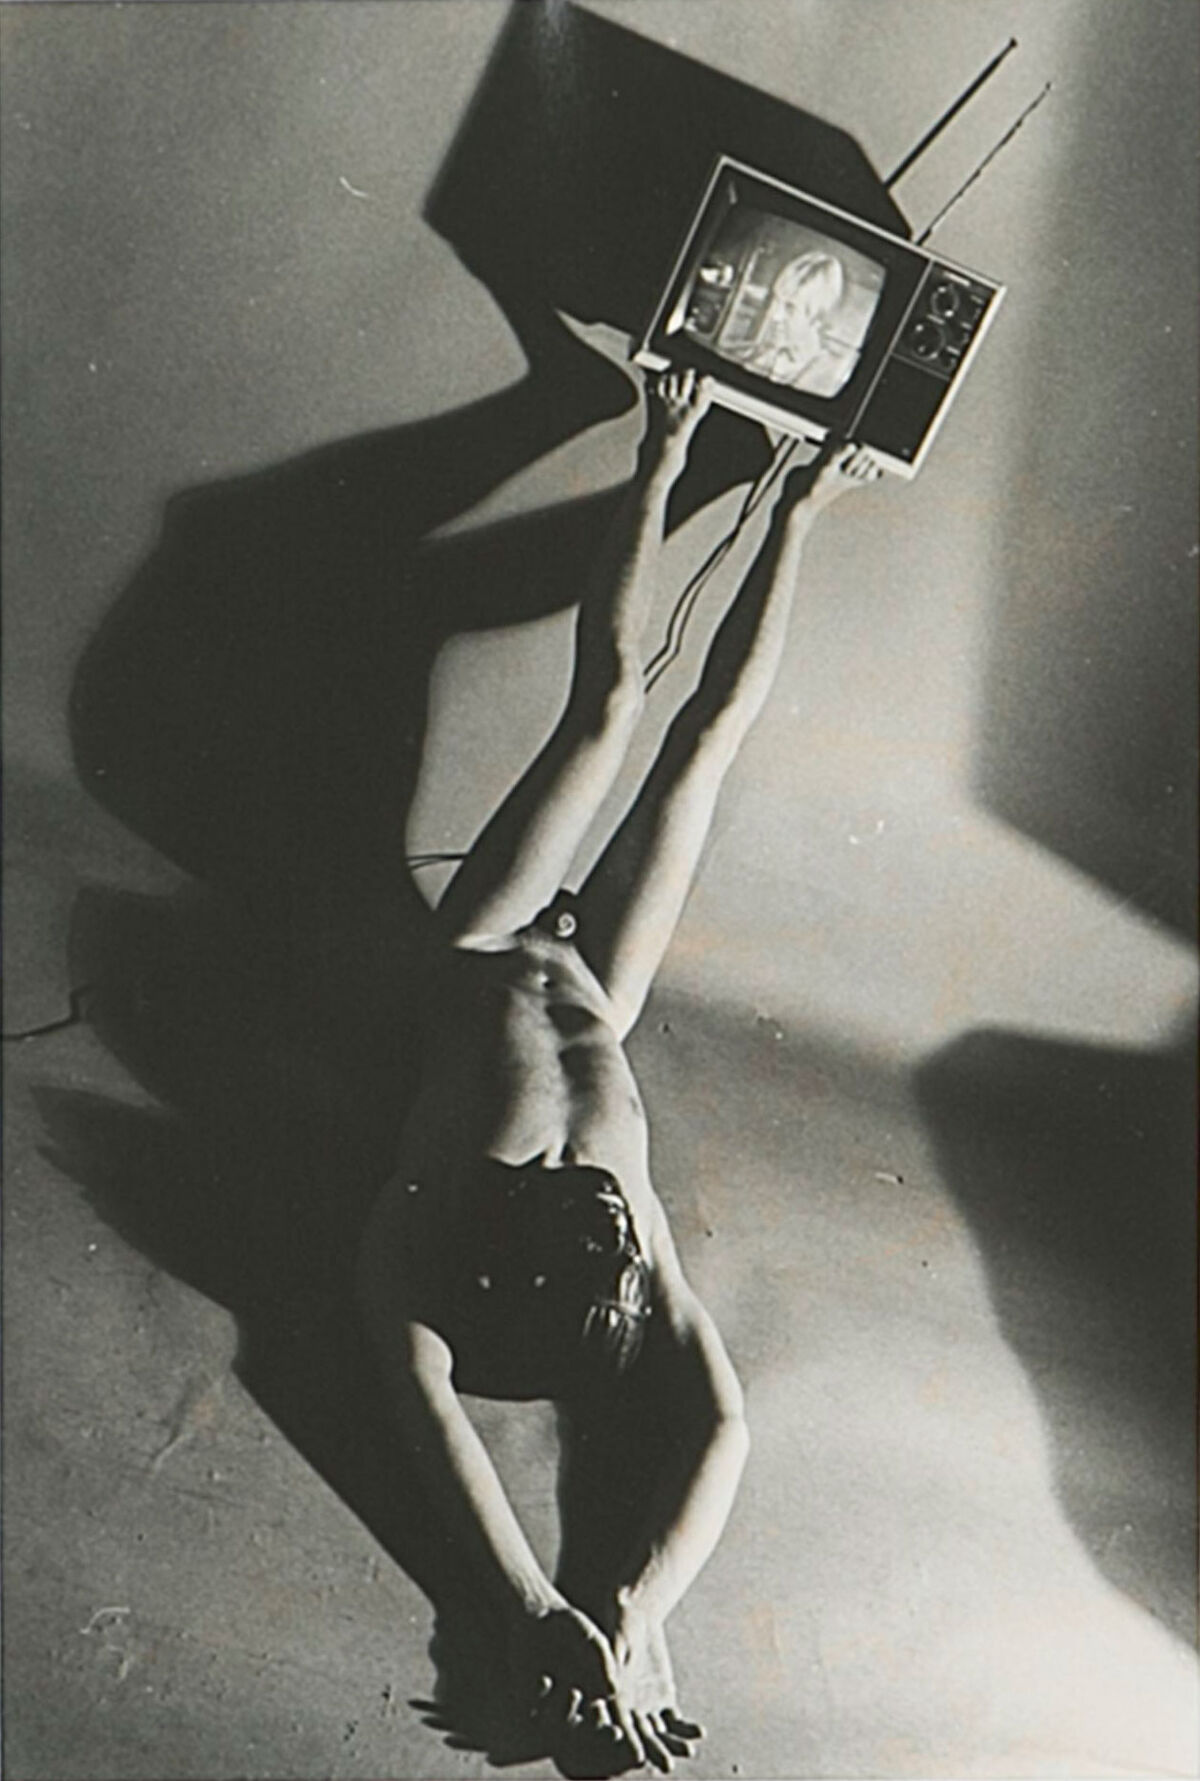 Jimmy DeSana, Television, 1978. Courtesy of the Jimmy DeSana Trust and Salon 94, New York.